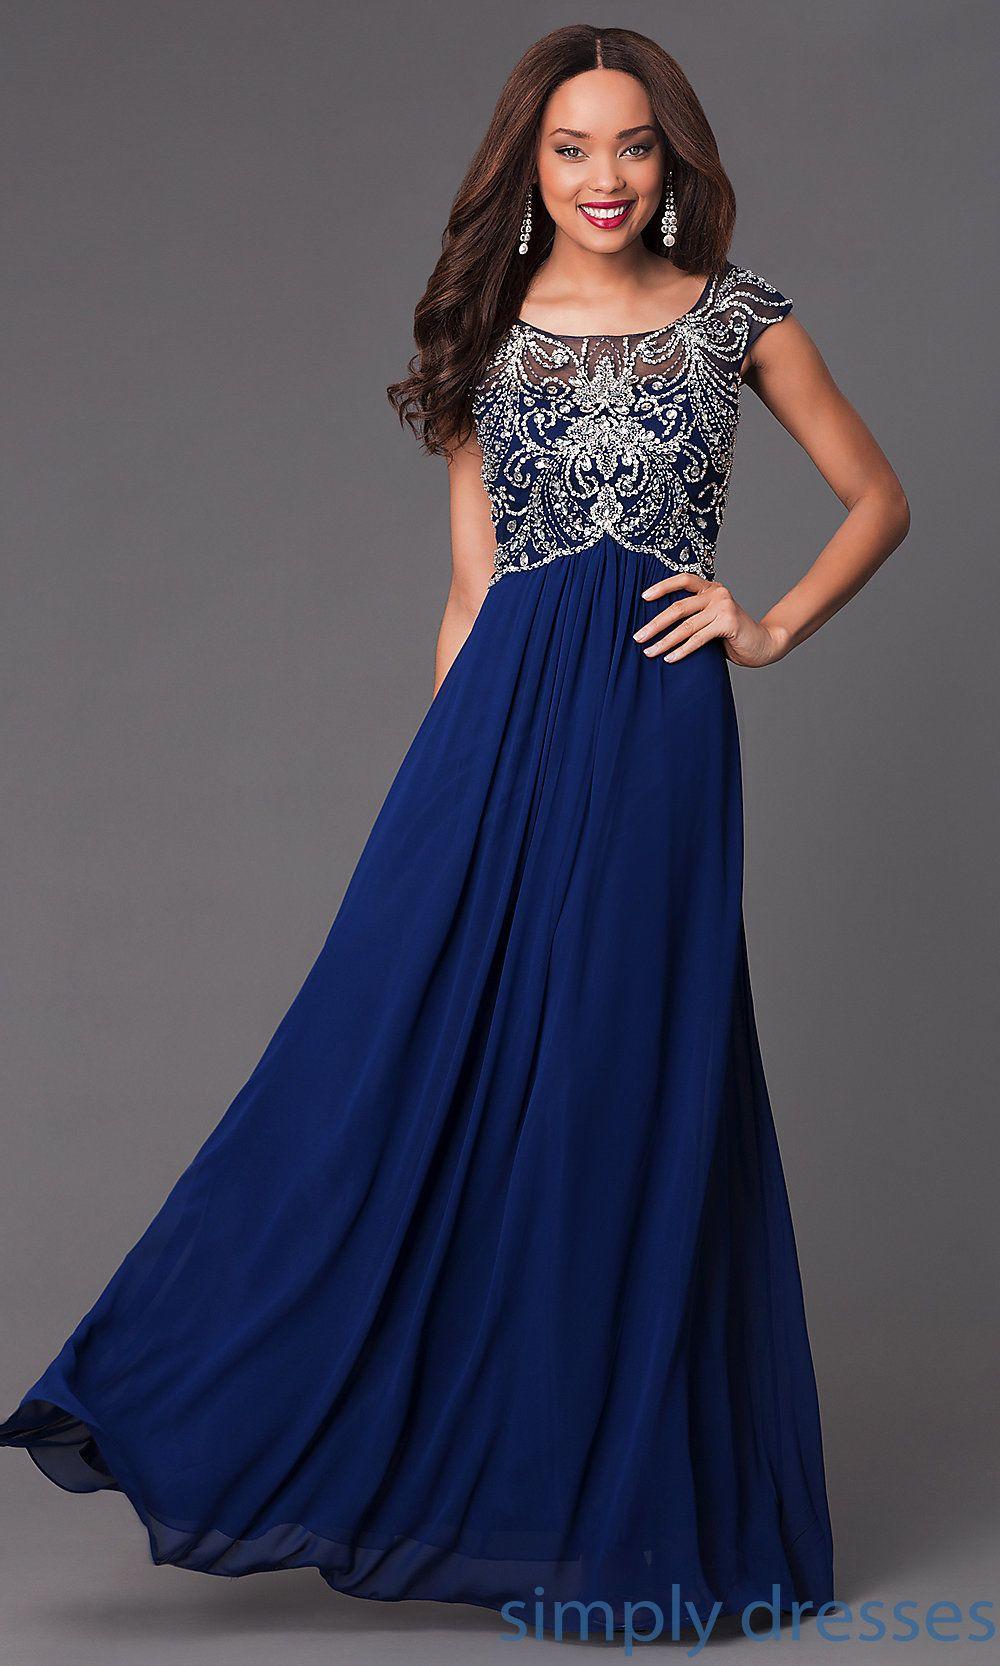 Capsleeve jeweledbodice long prom dress i feel pretty